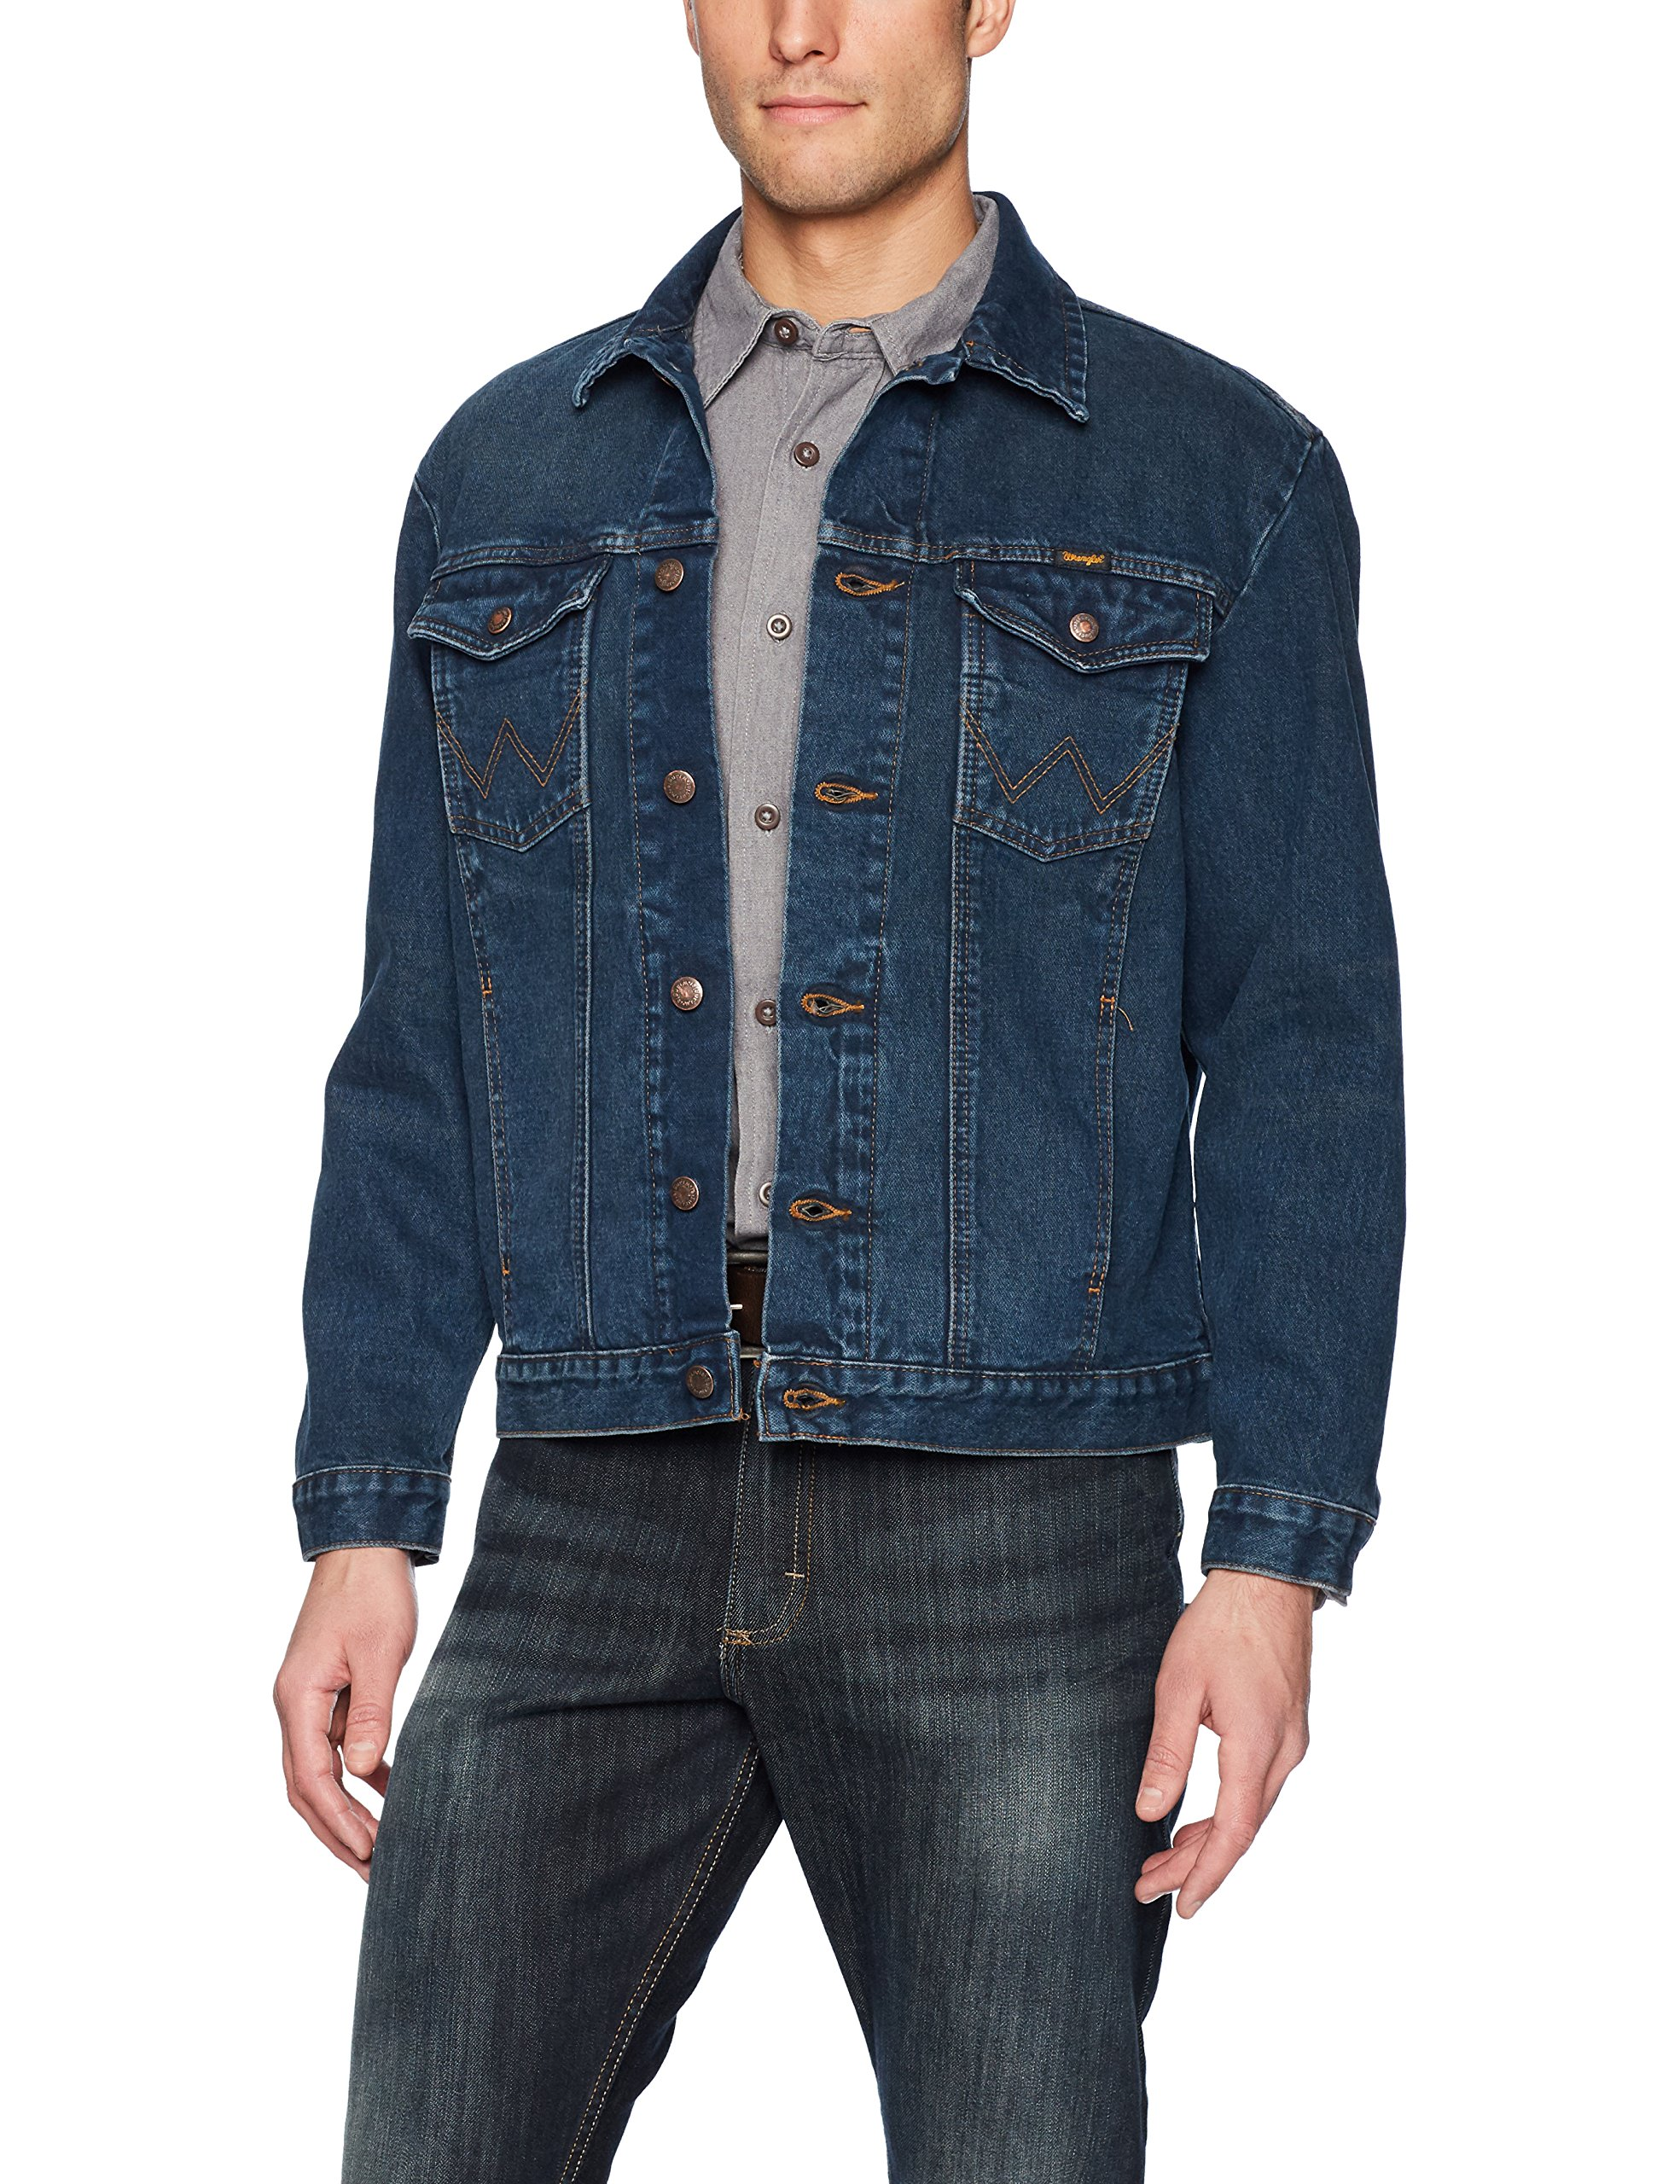 Wrangler Men's Western Style Denim Jacket, Dark Blue, L